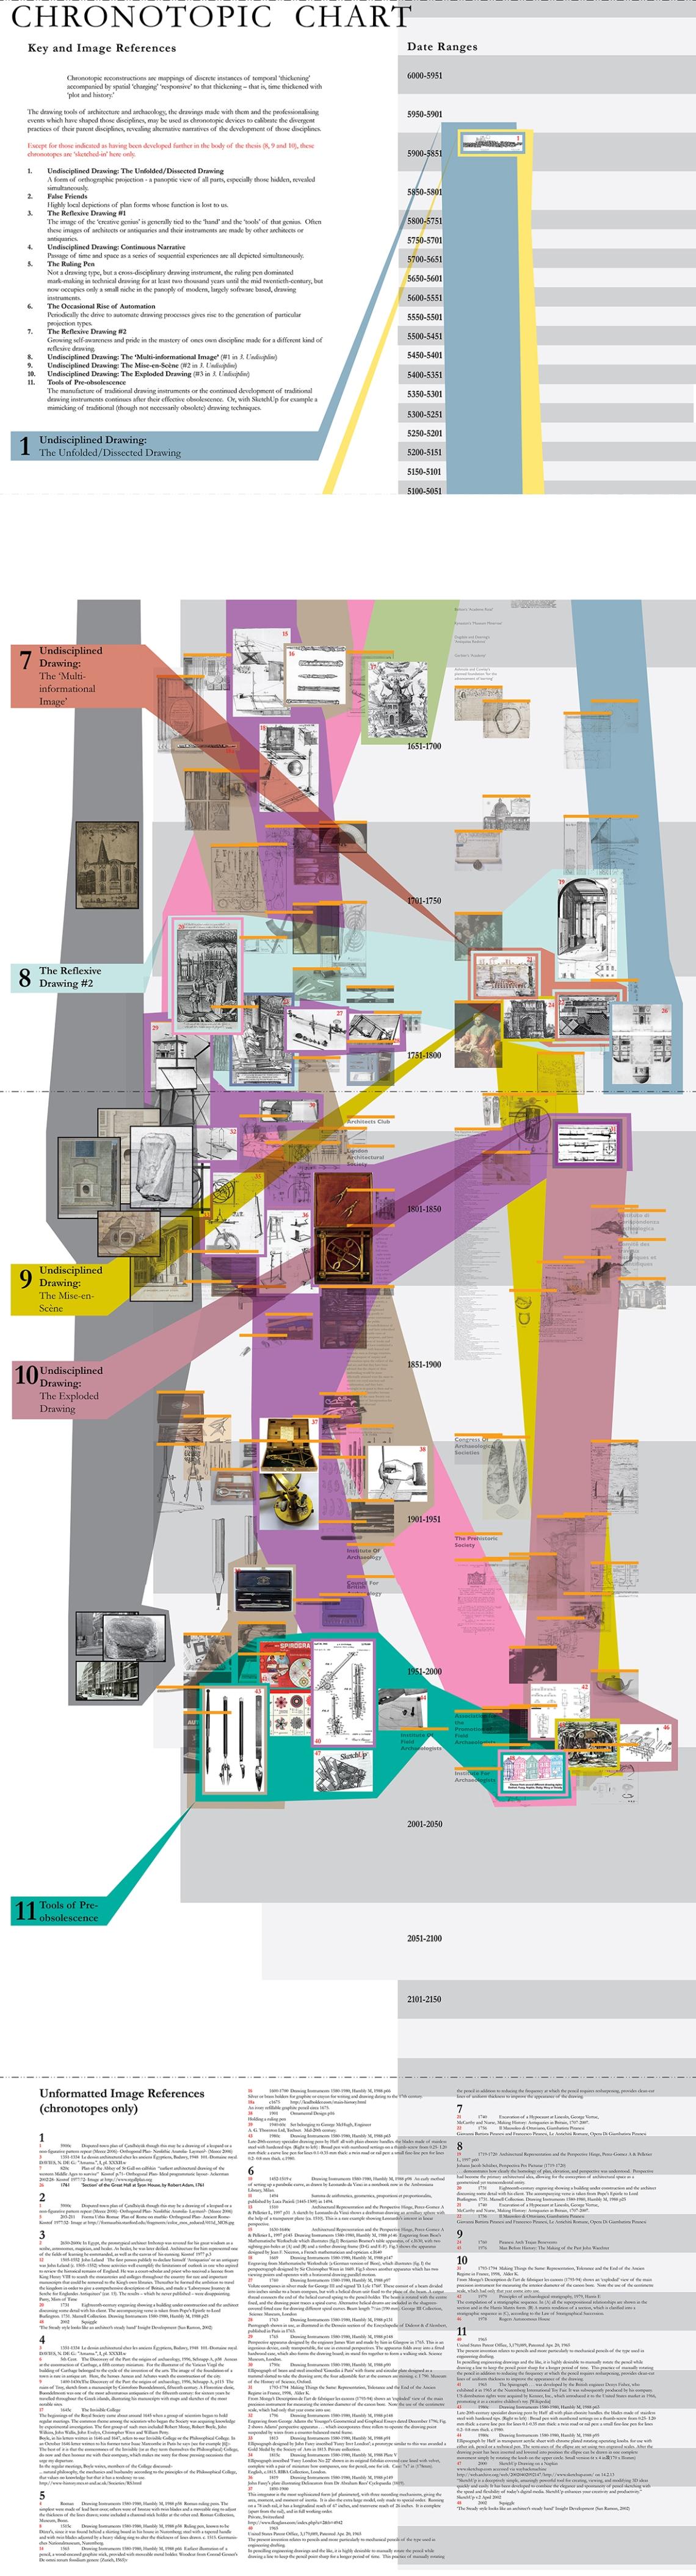 Chronotope_Diagram_RevO